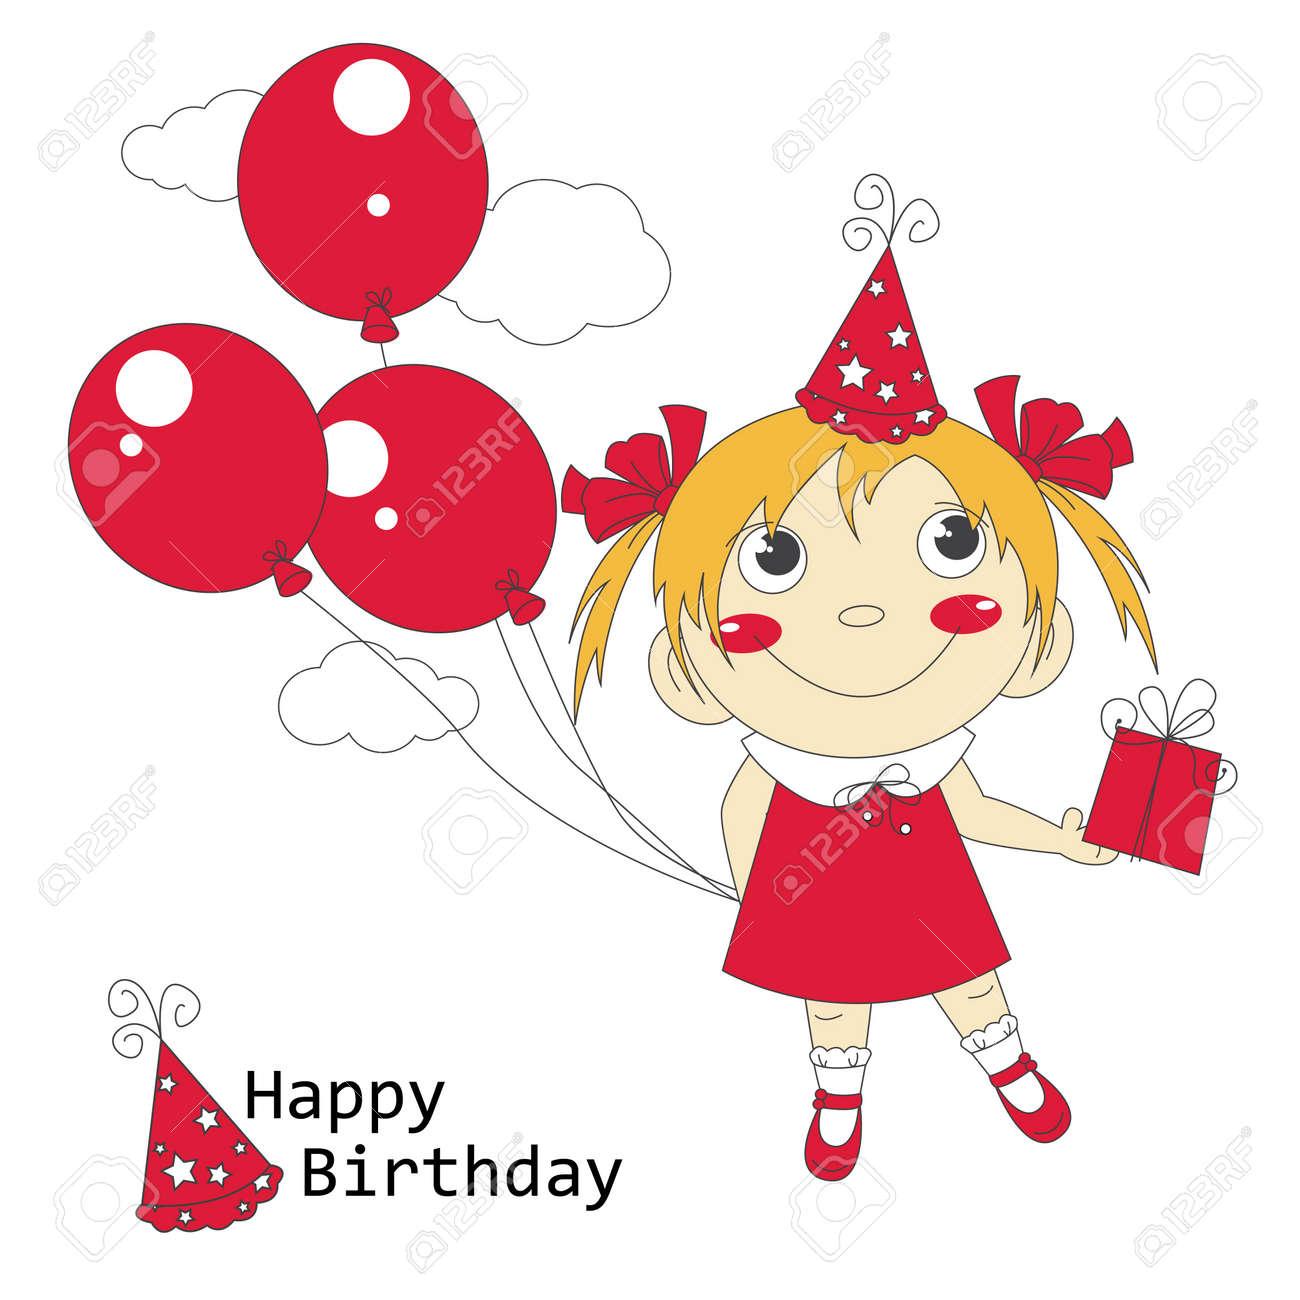 Gray Air Balloons Giftstock Vector Happy Birthday Illustration Little Girl Little Girl Happy Birthday Illustration Air Balloons gifts Happy Birthday Girls